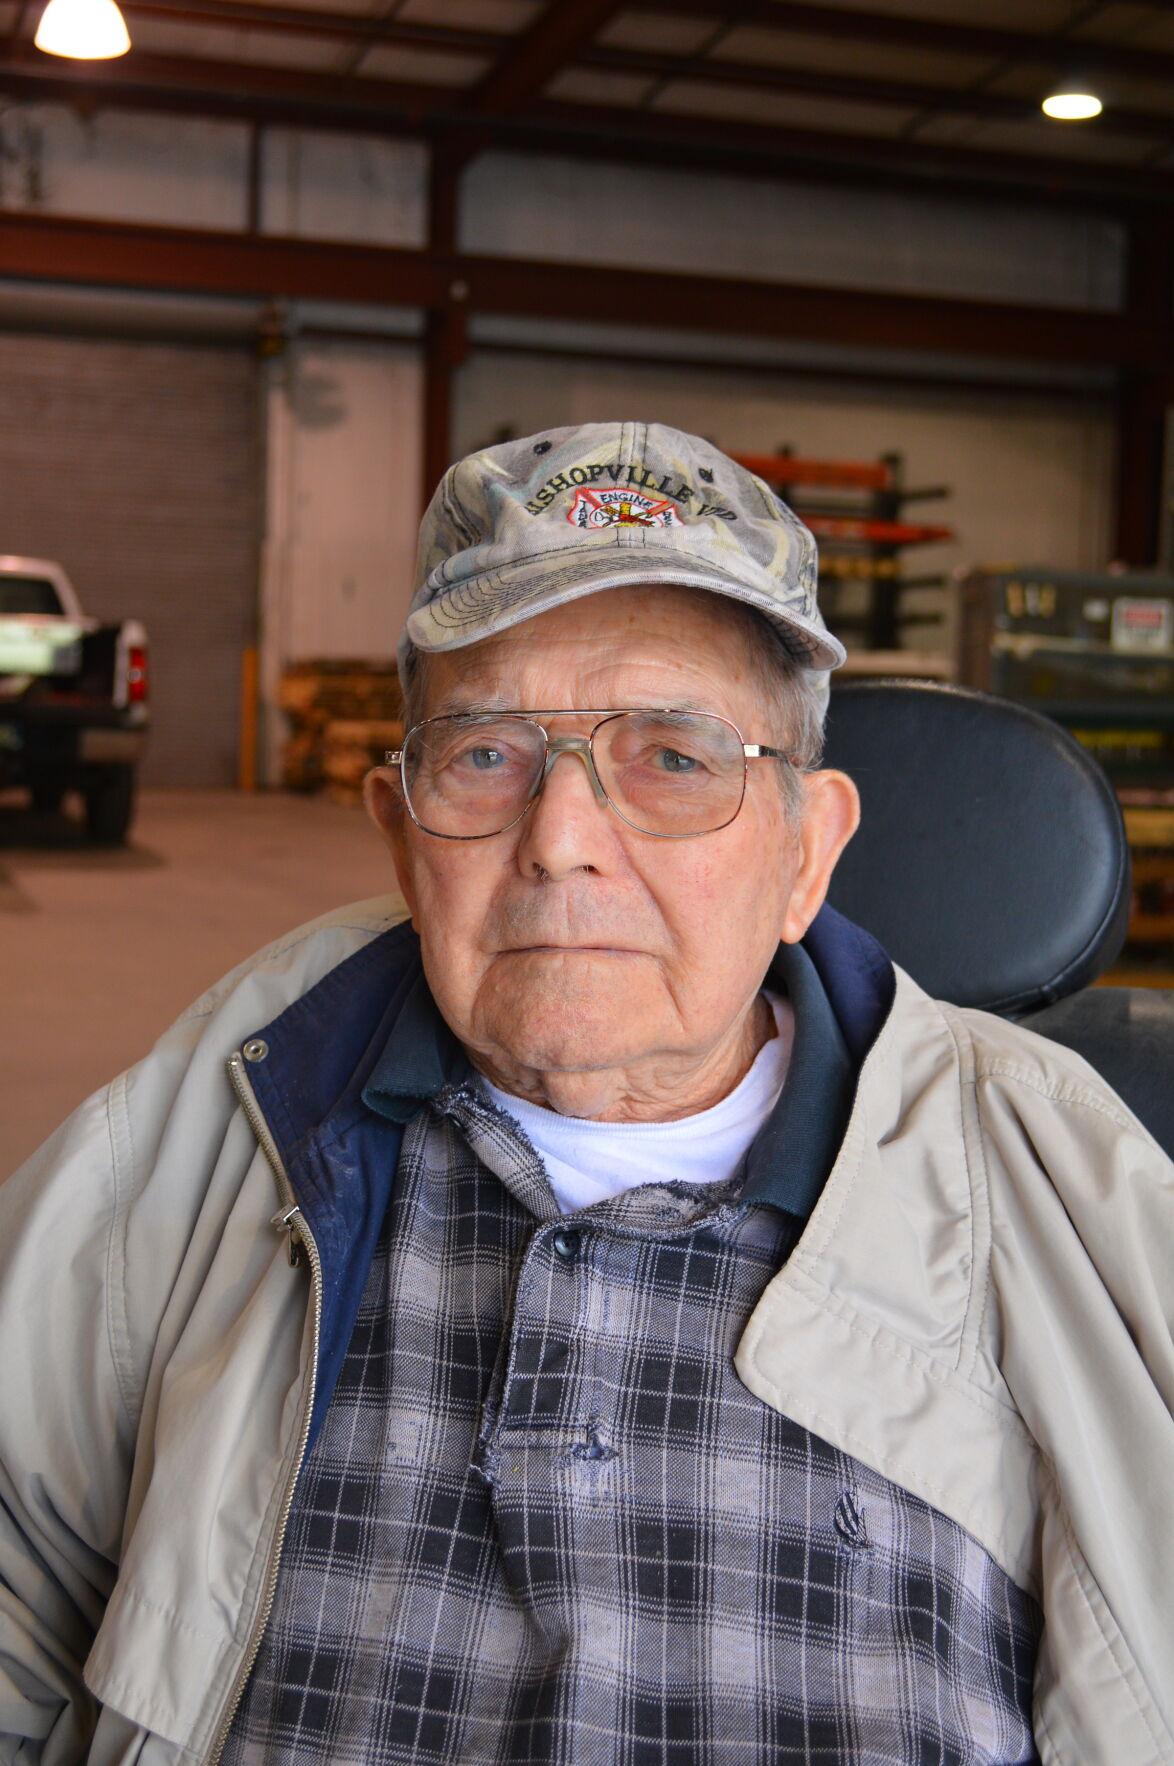 Warren Mumford turning 99